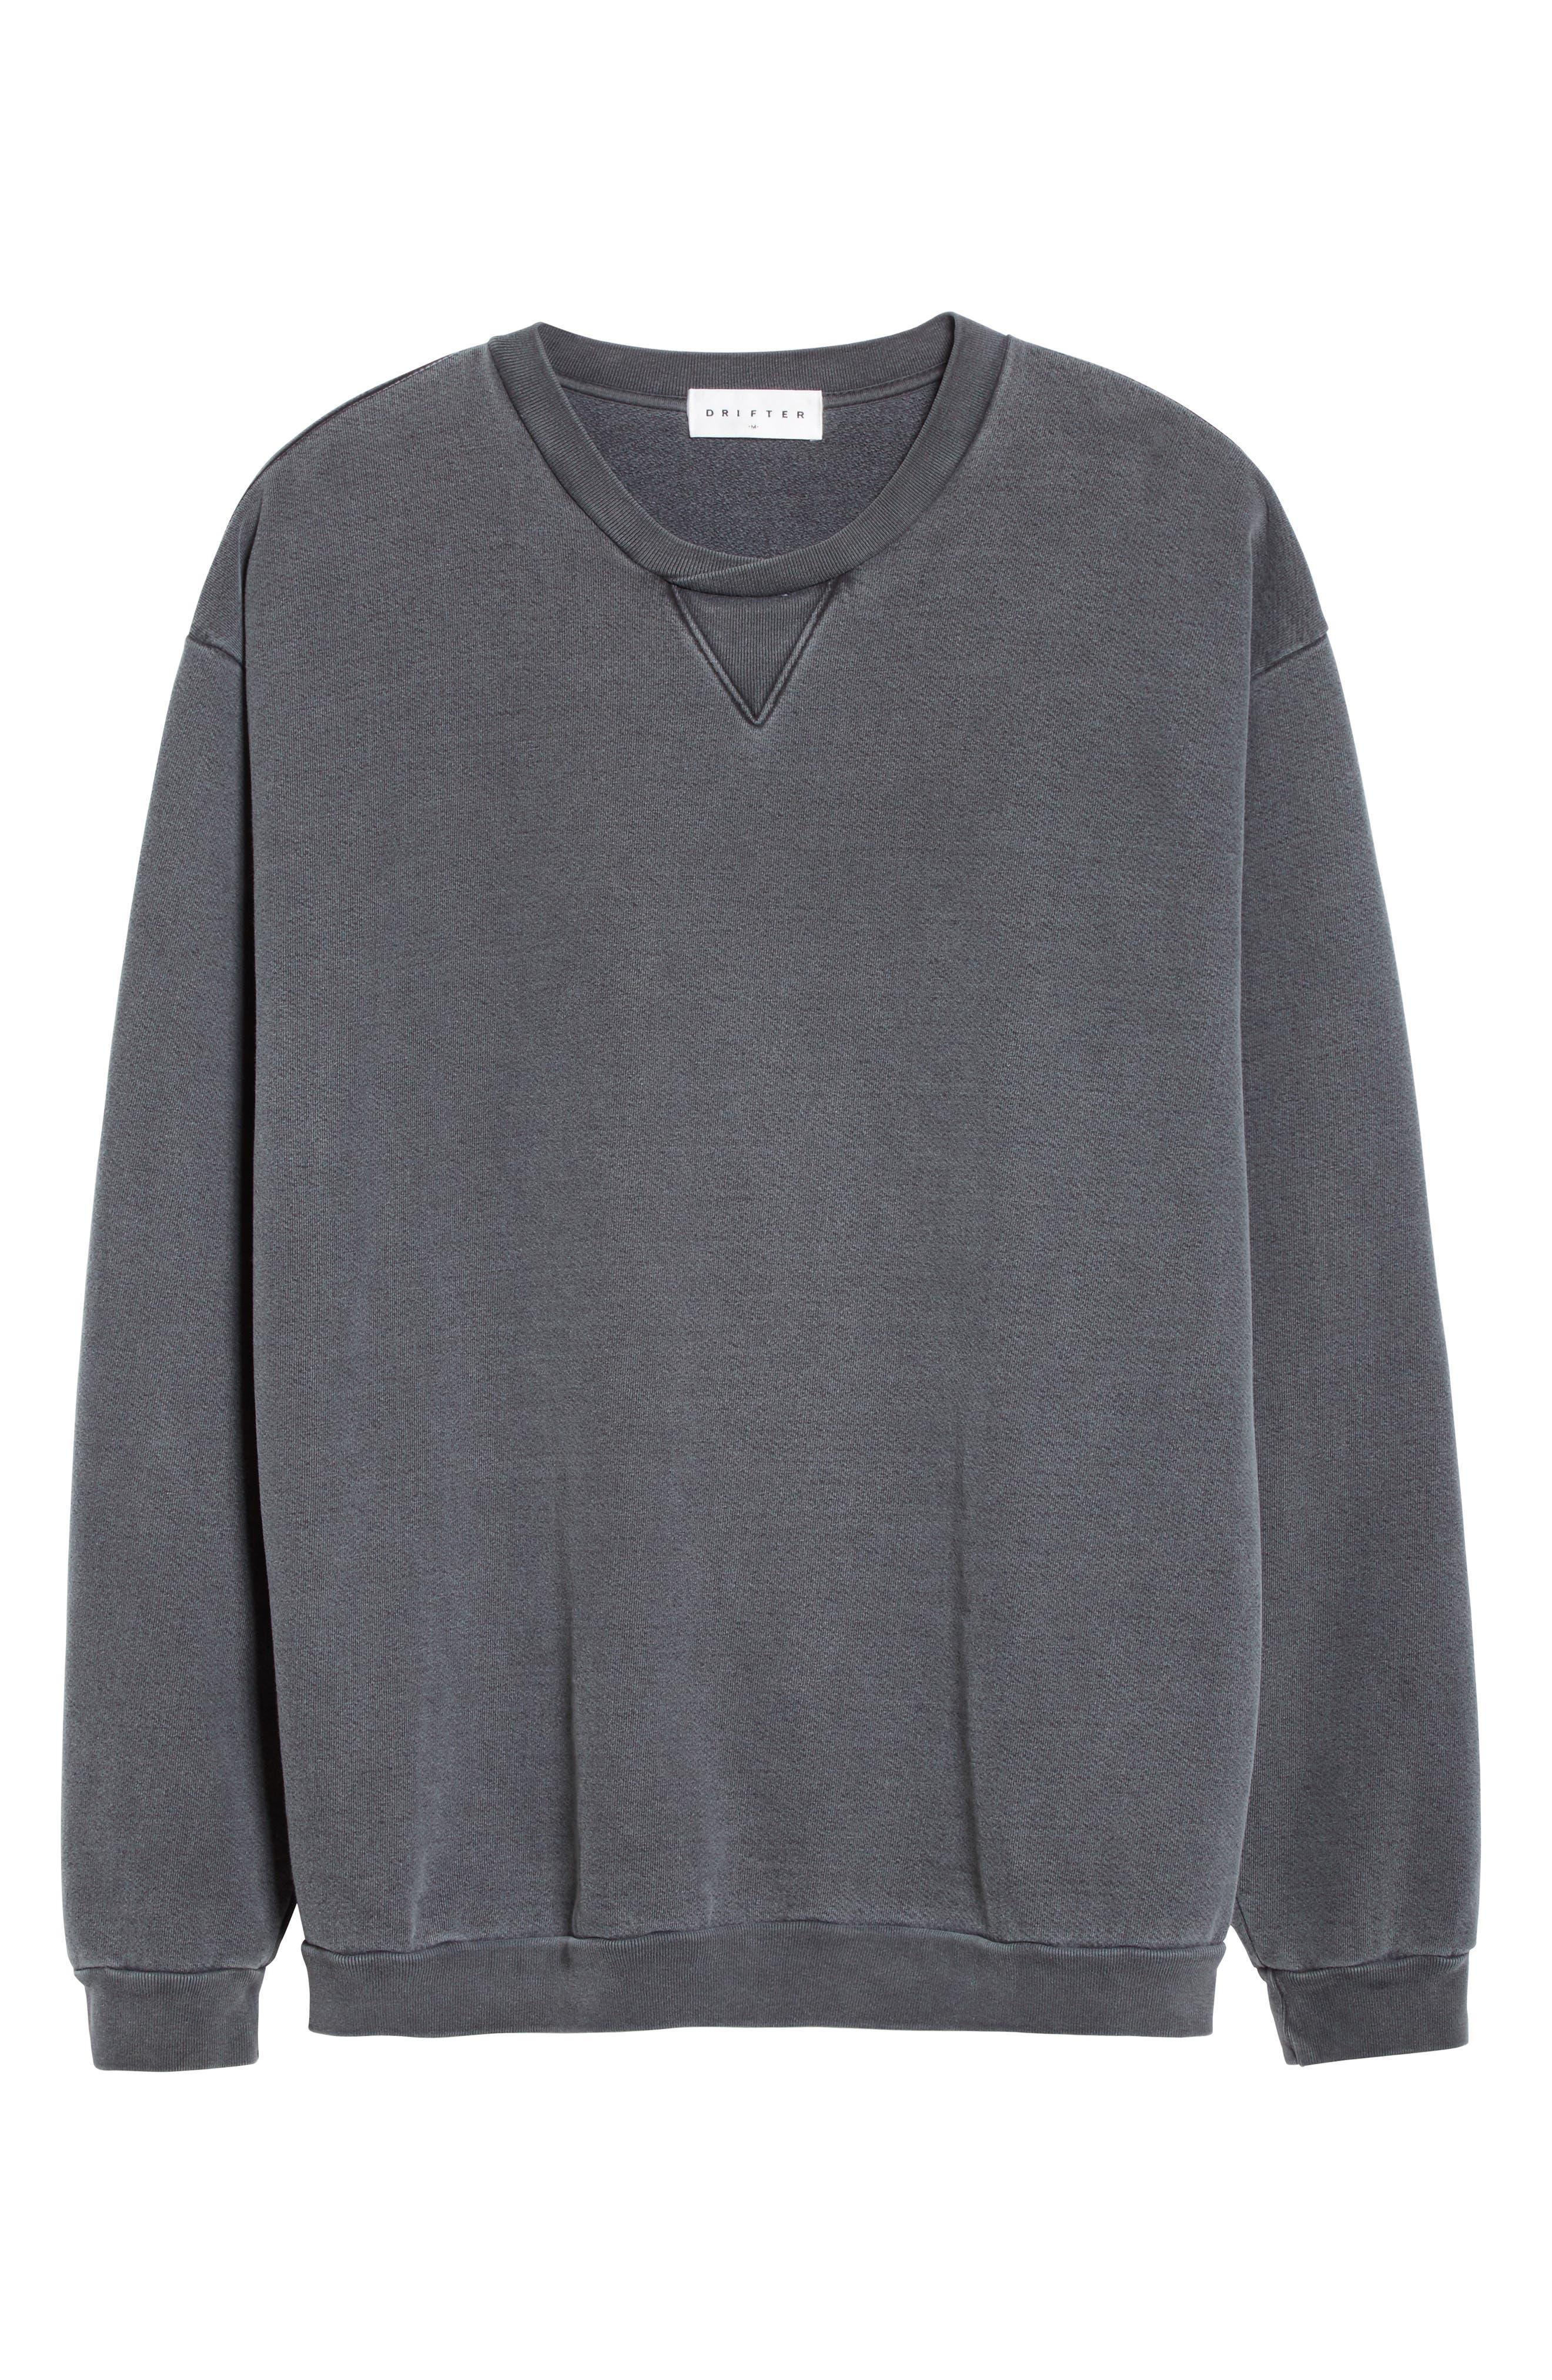 Norton Sweatshirt,                             Alternate thumbnail 6, color,                             Black Pigment